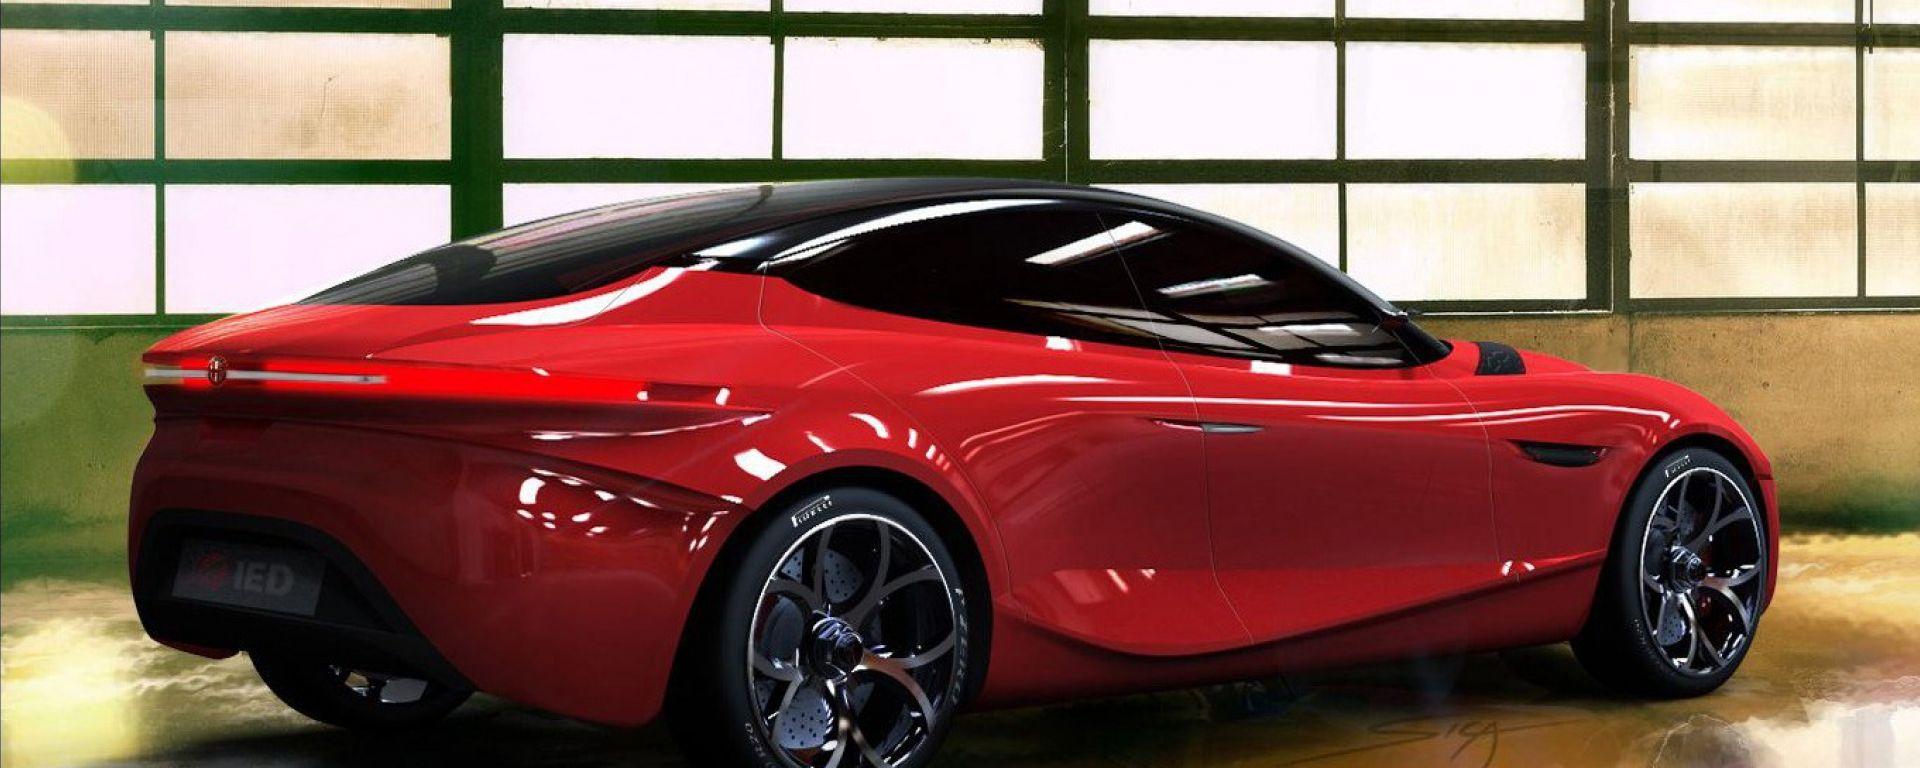 Alfa Romeo Gloria, nuove immagini dal web